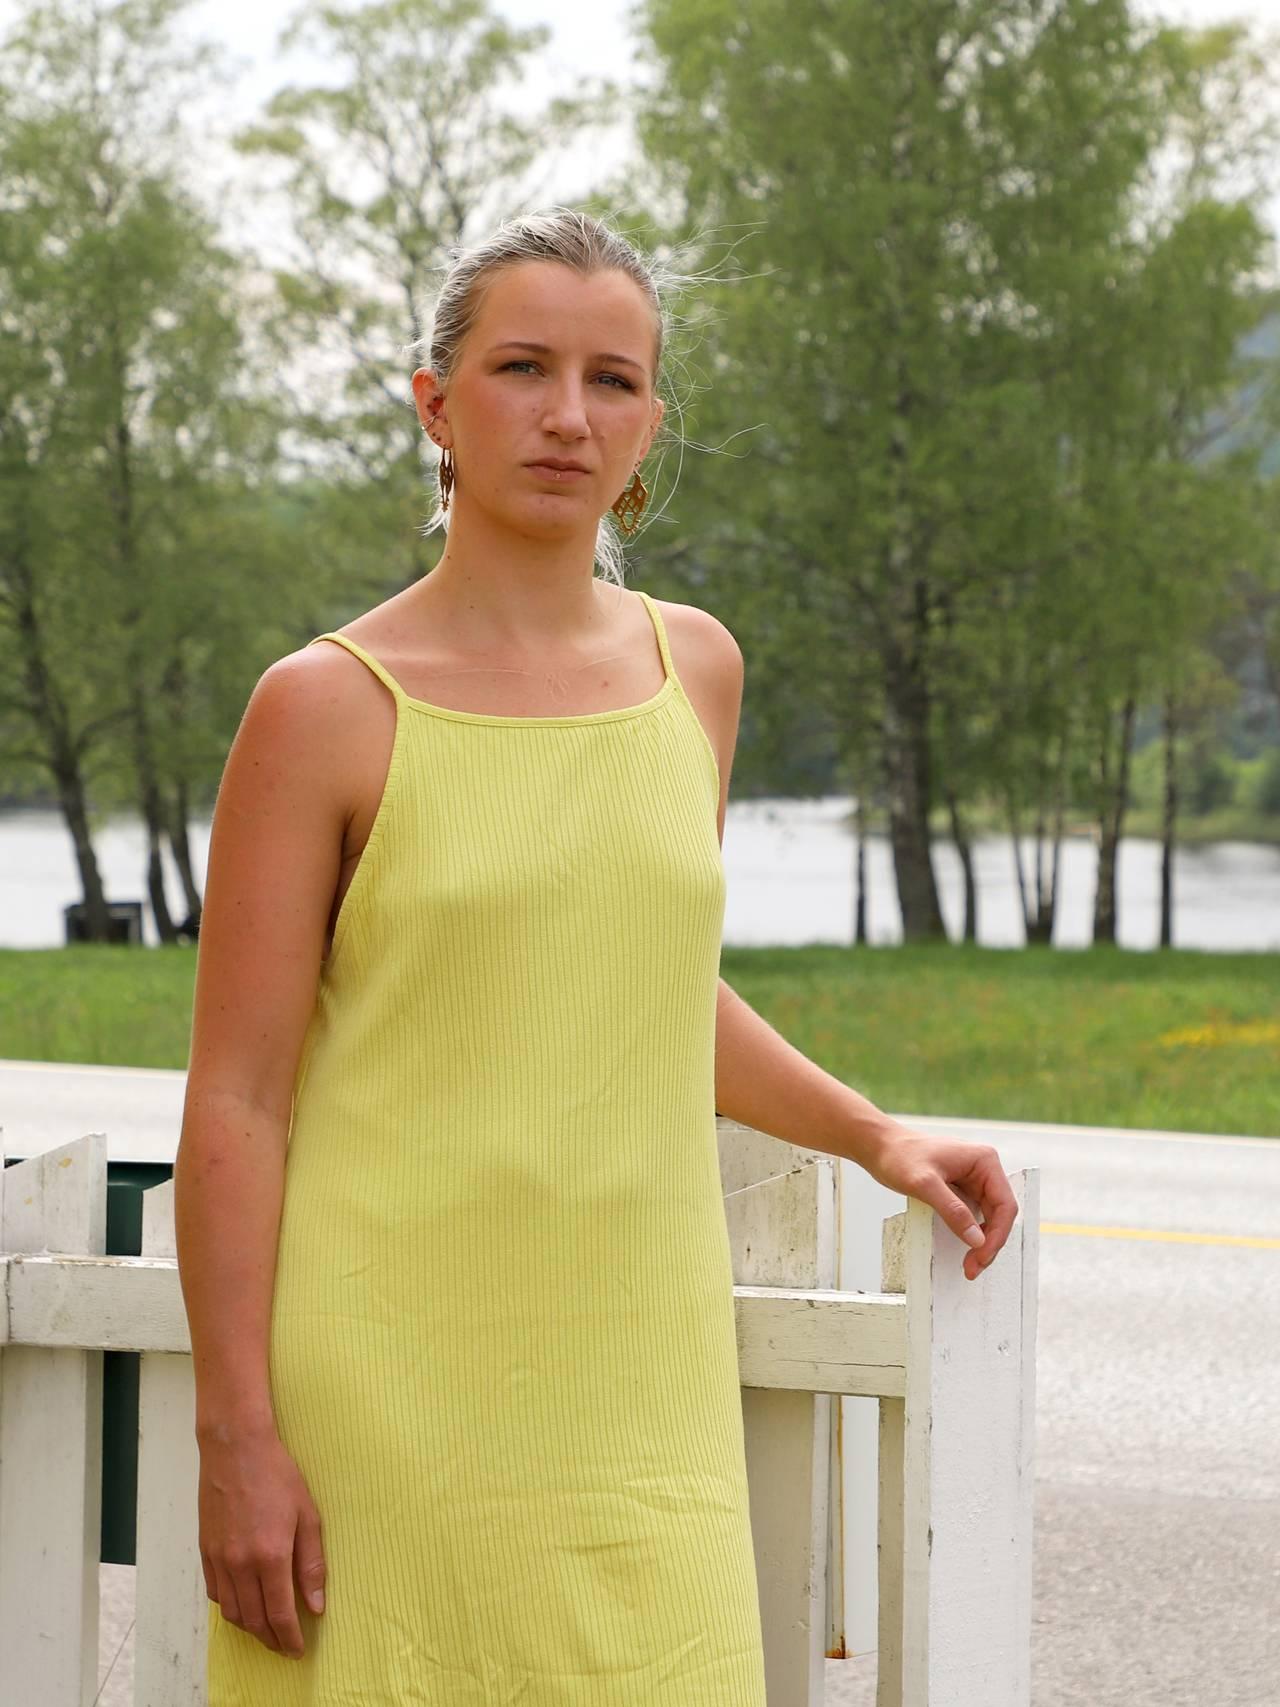 Mia Heilberg